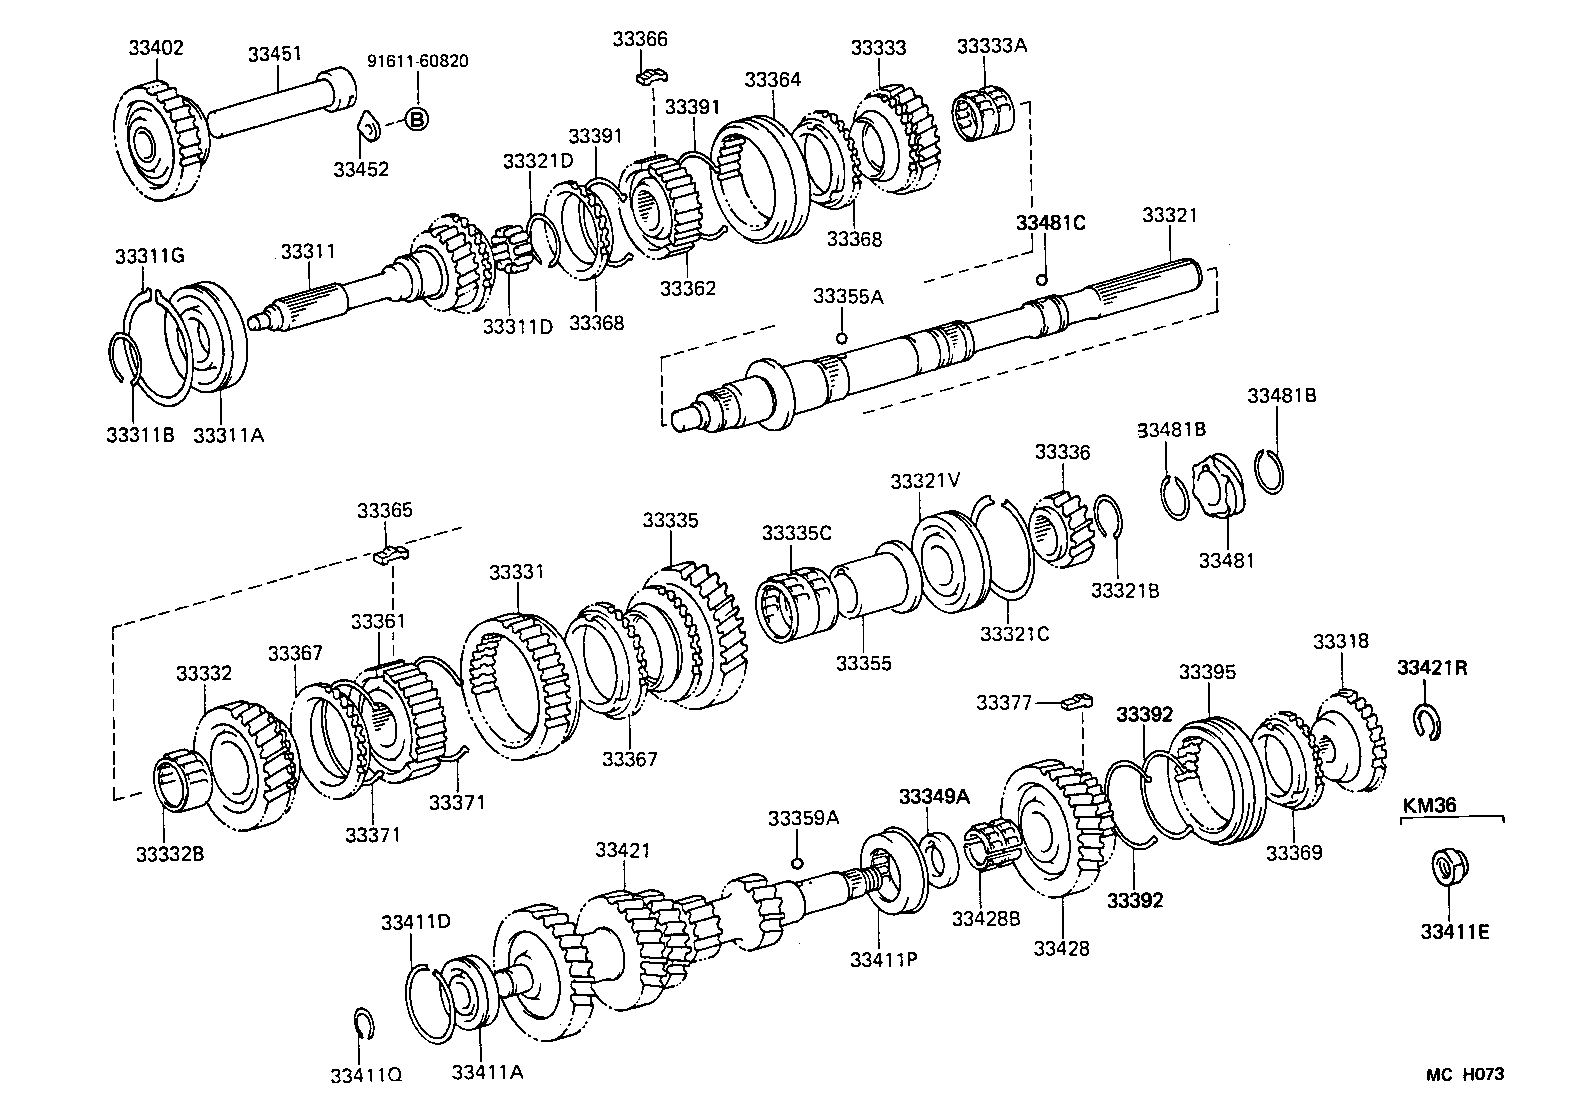 toyota liteacekm30lg-mds - powertrain-chassis